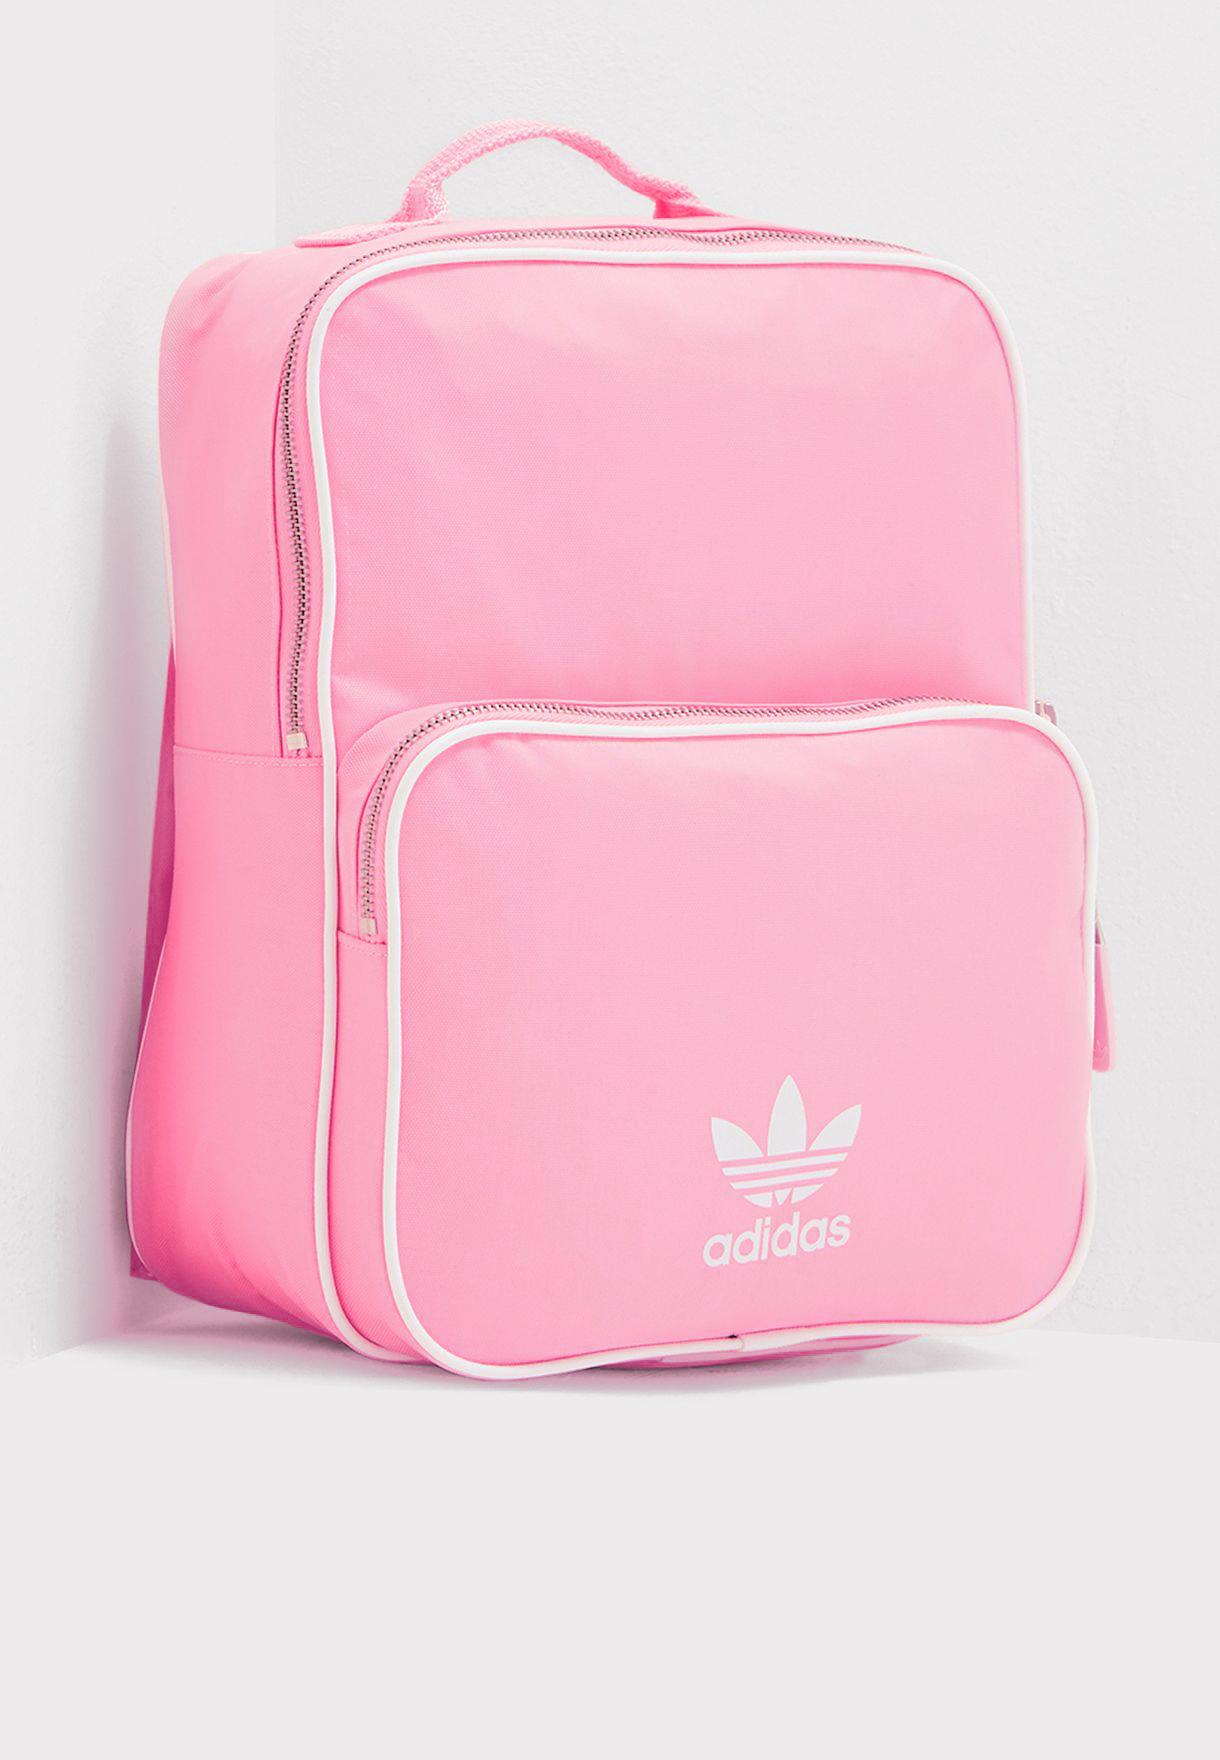 48cbdba0b00b6 adidas Originals Classic Medium Backpack - SPORTING GOODS Backpacks ...